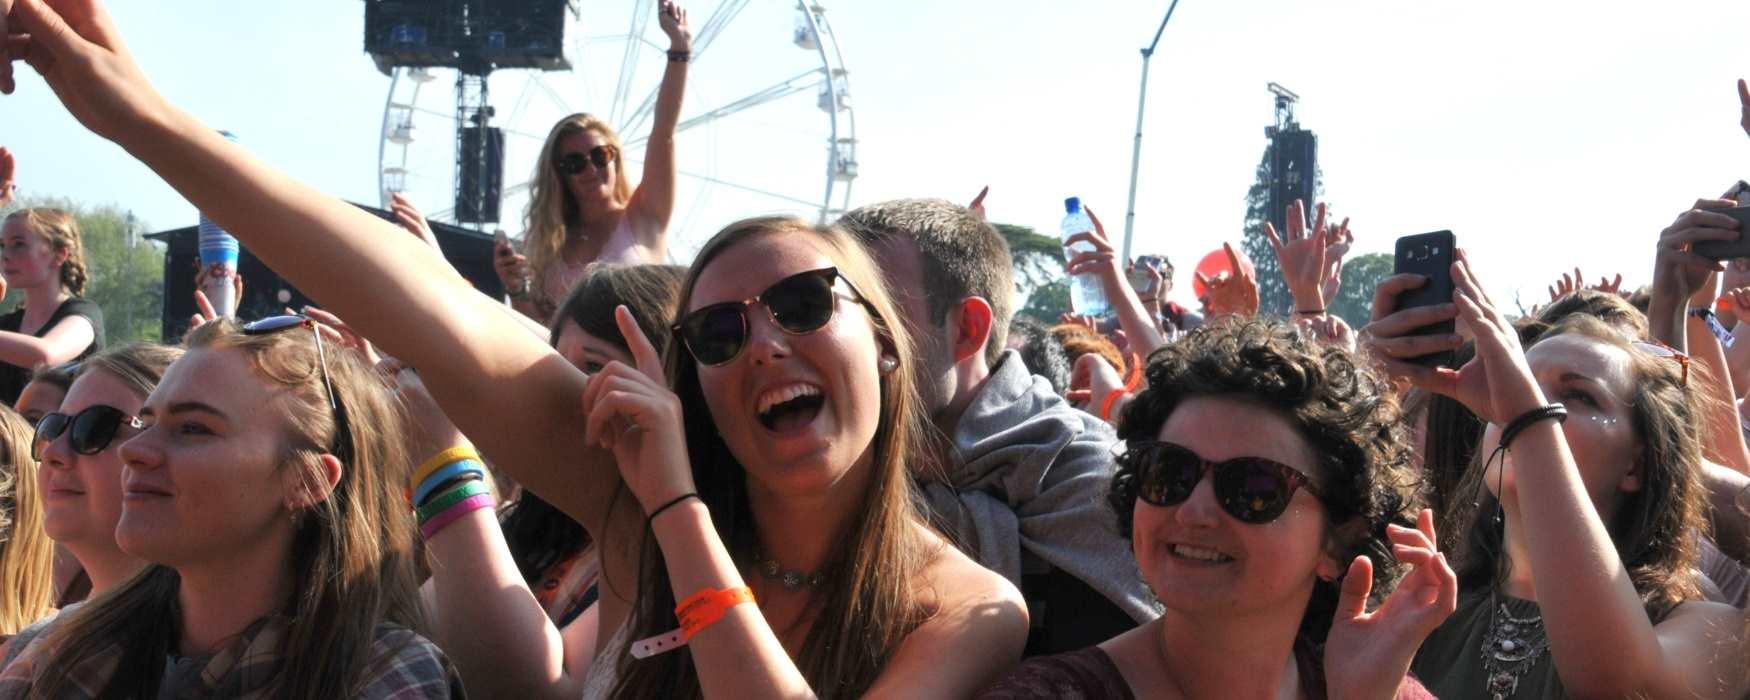 Radio 1's Big Weekend 2016 in Exeter